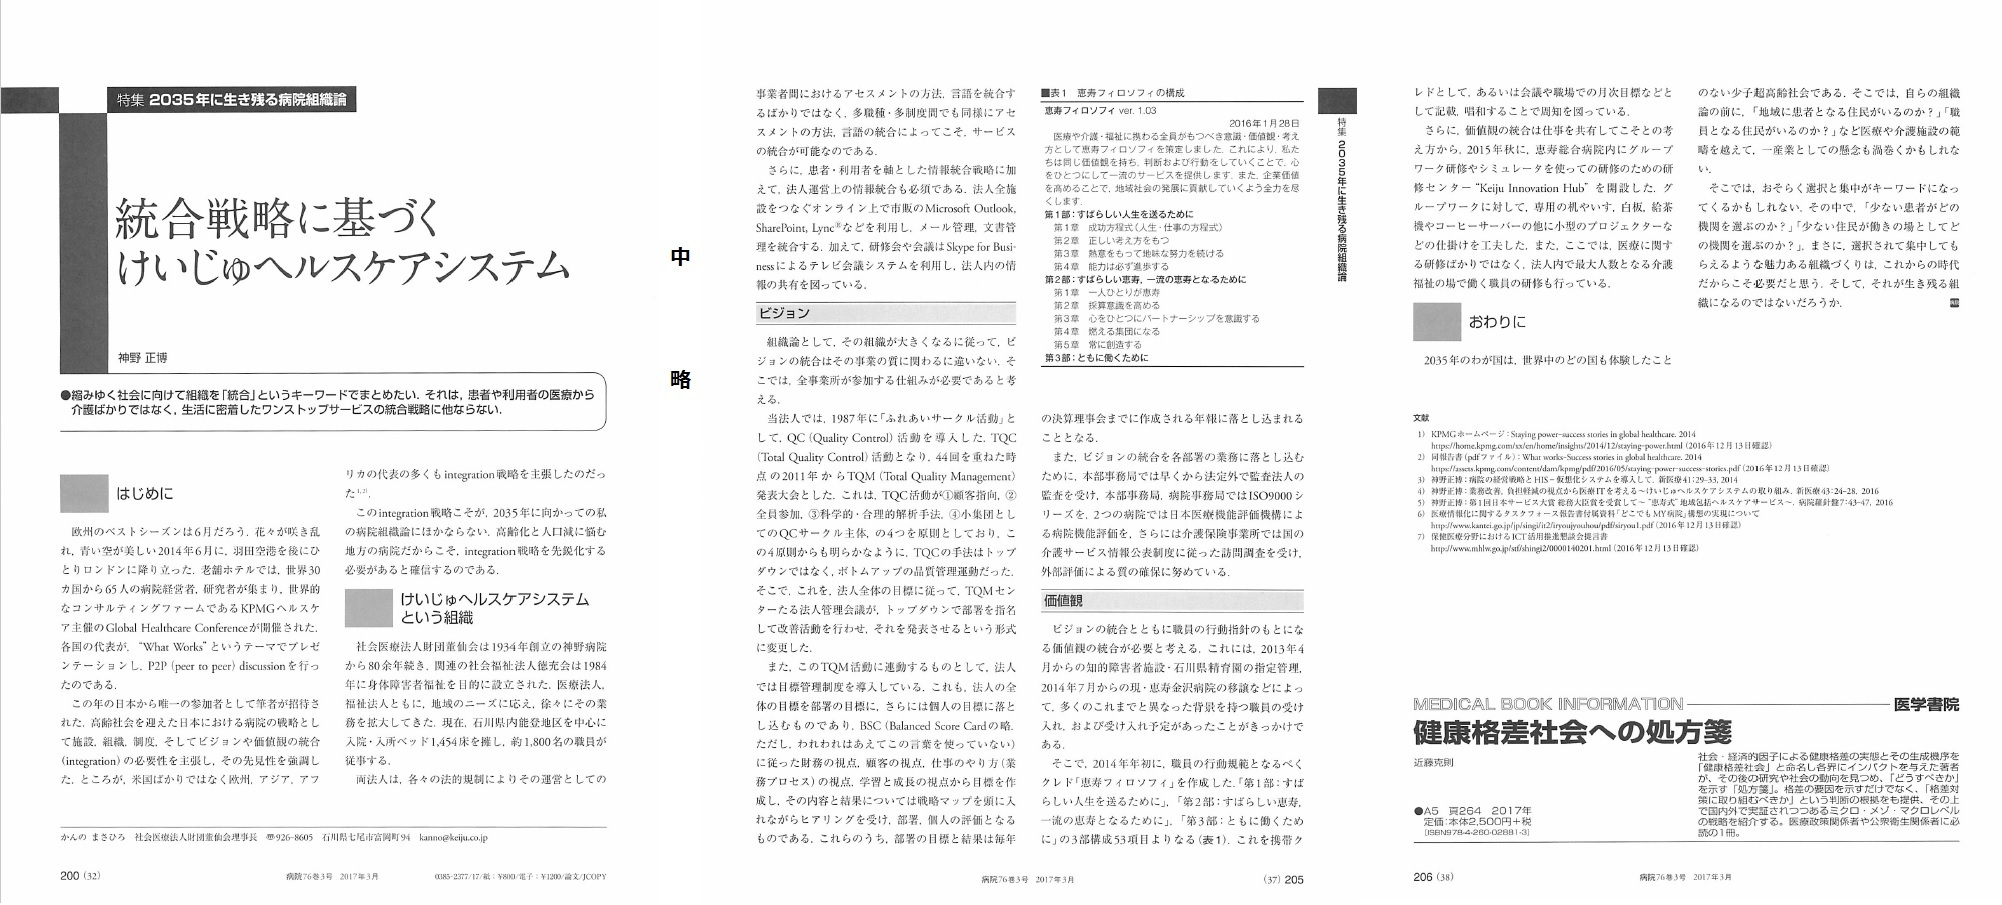 Back to the Basic~対談 災害医療_b0115629_17505425.jpg